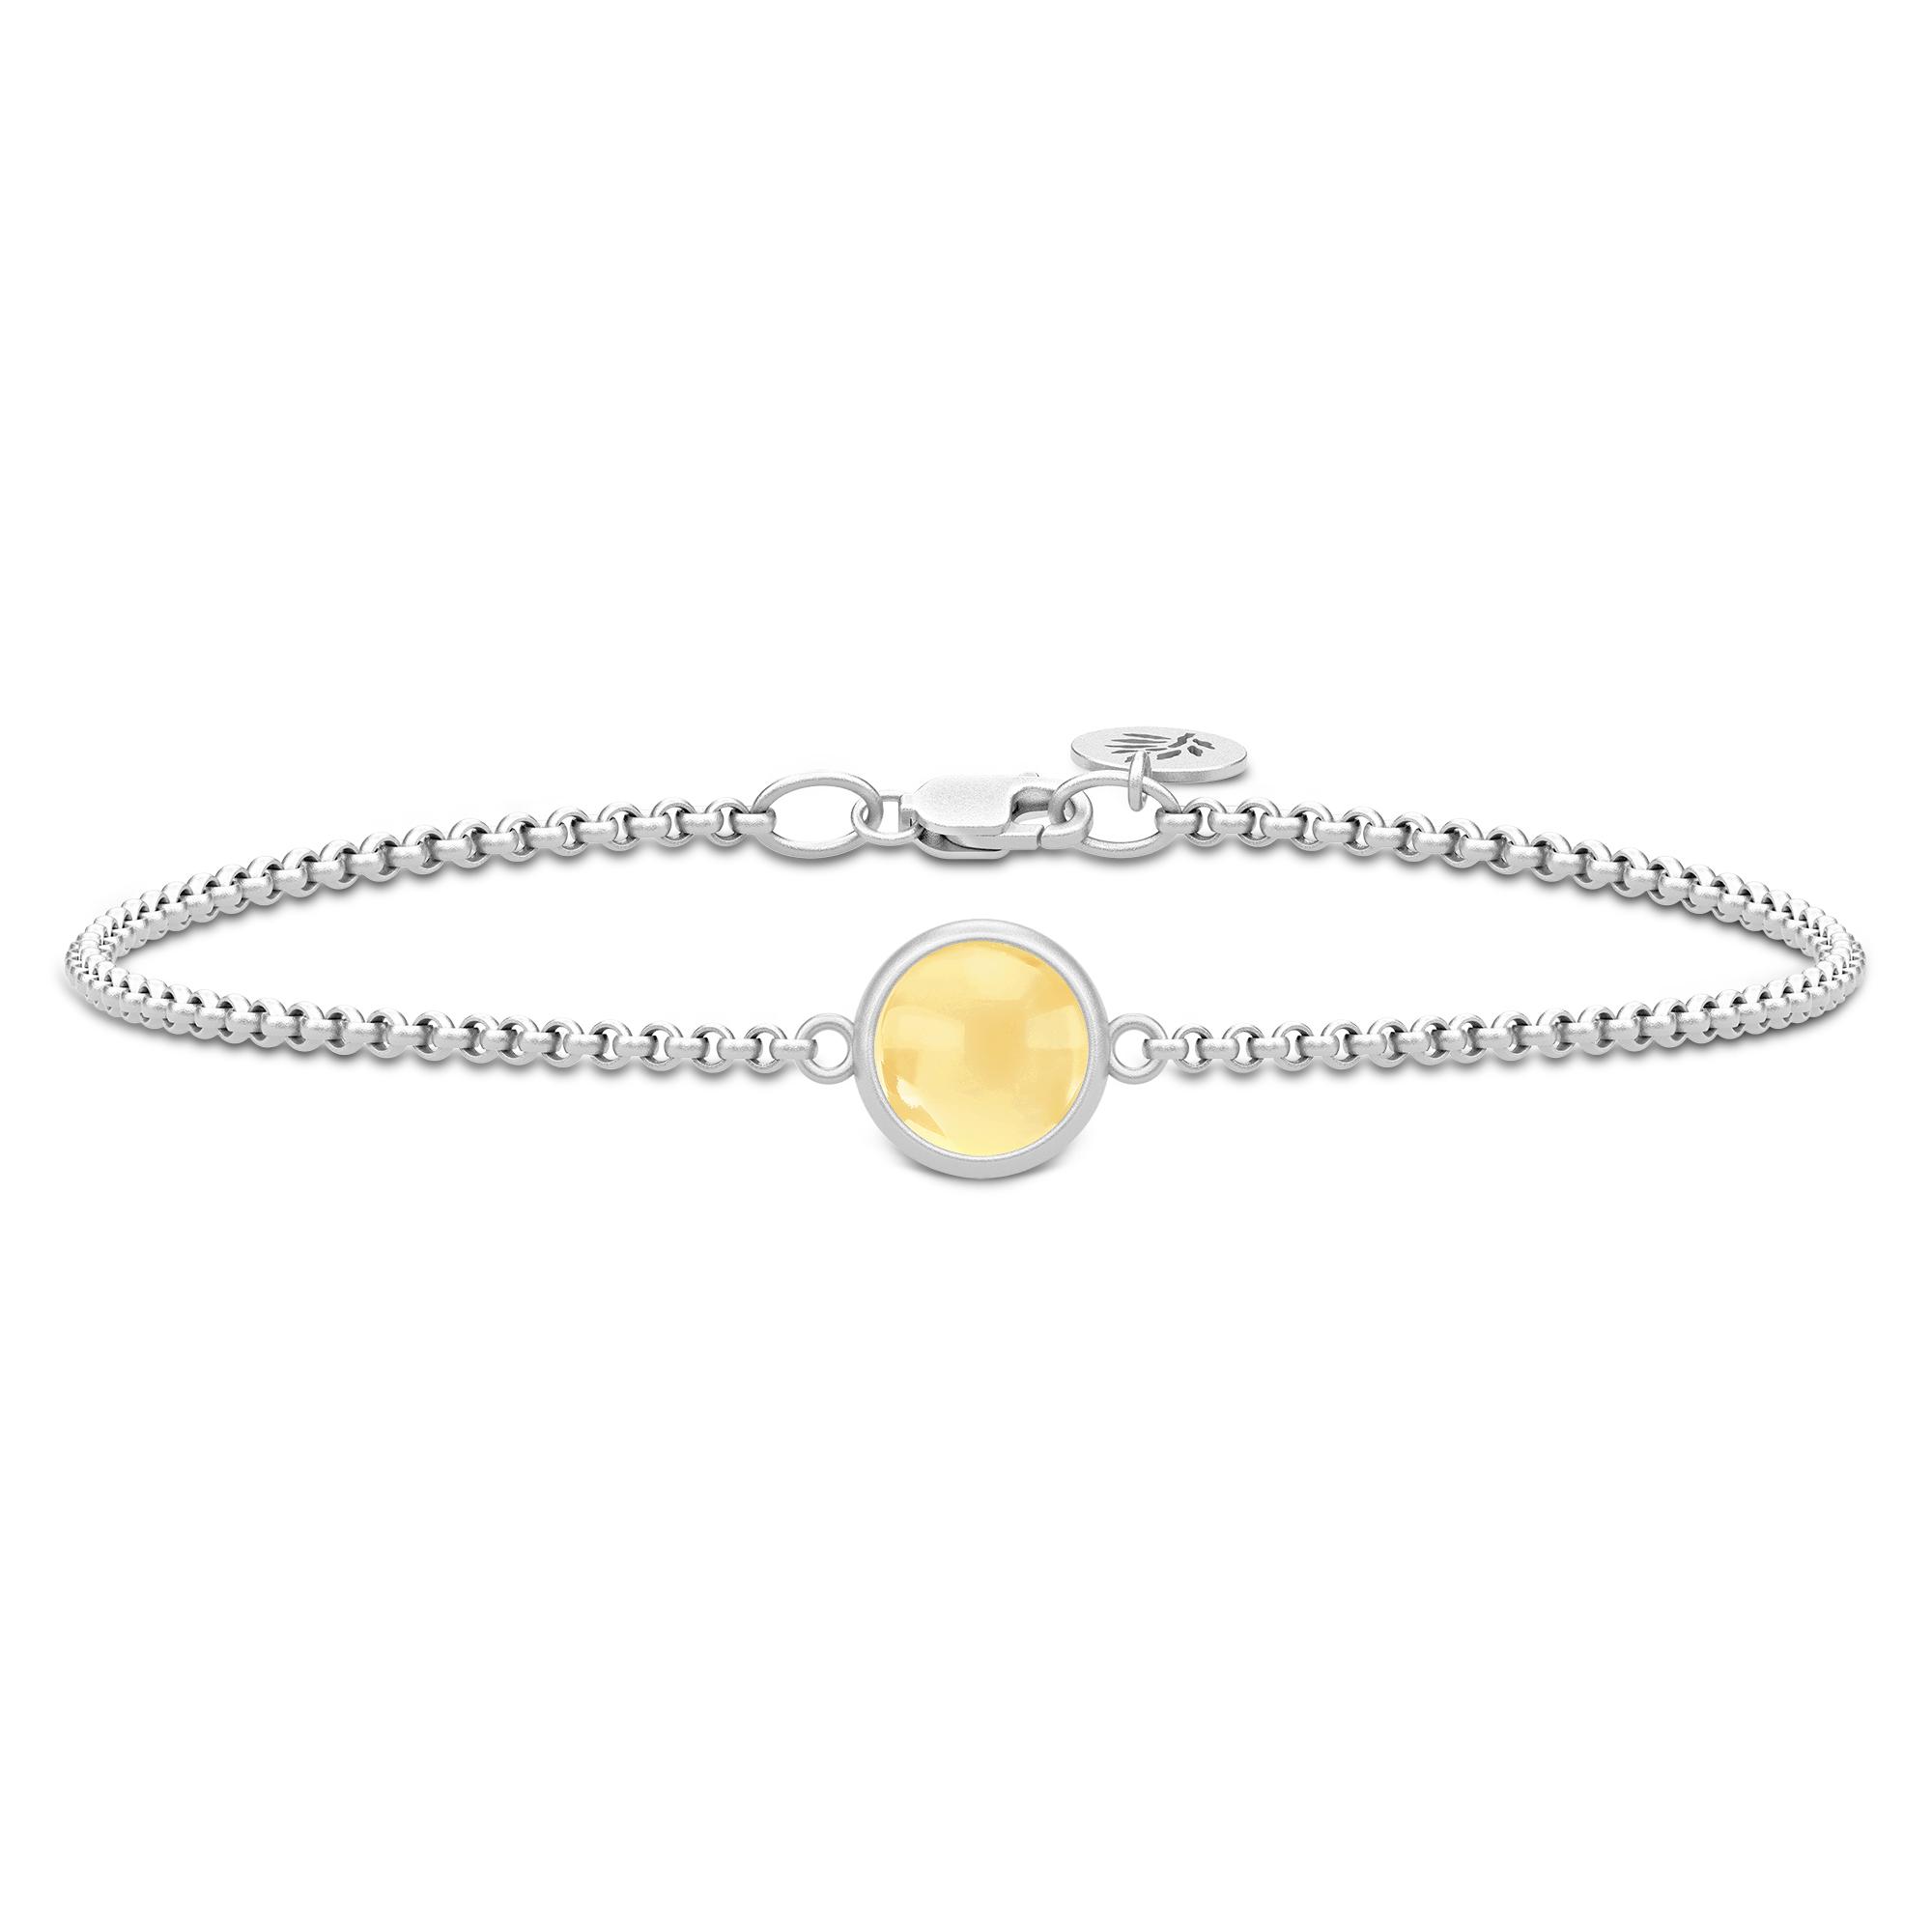 Julie Sandlau Primini armbånd i sølv med gul citrin krystal